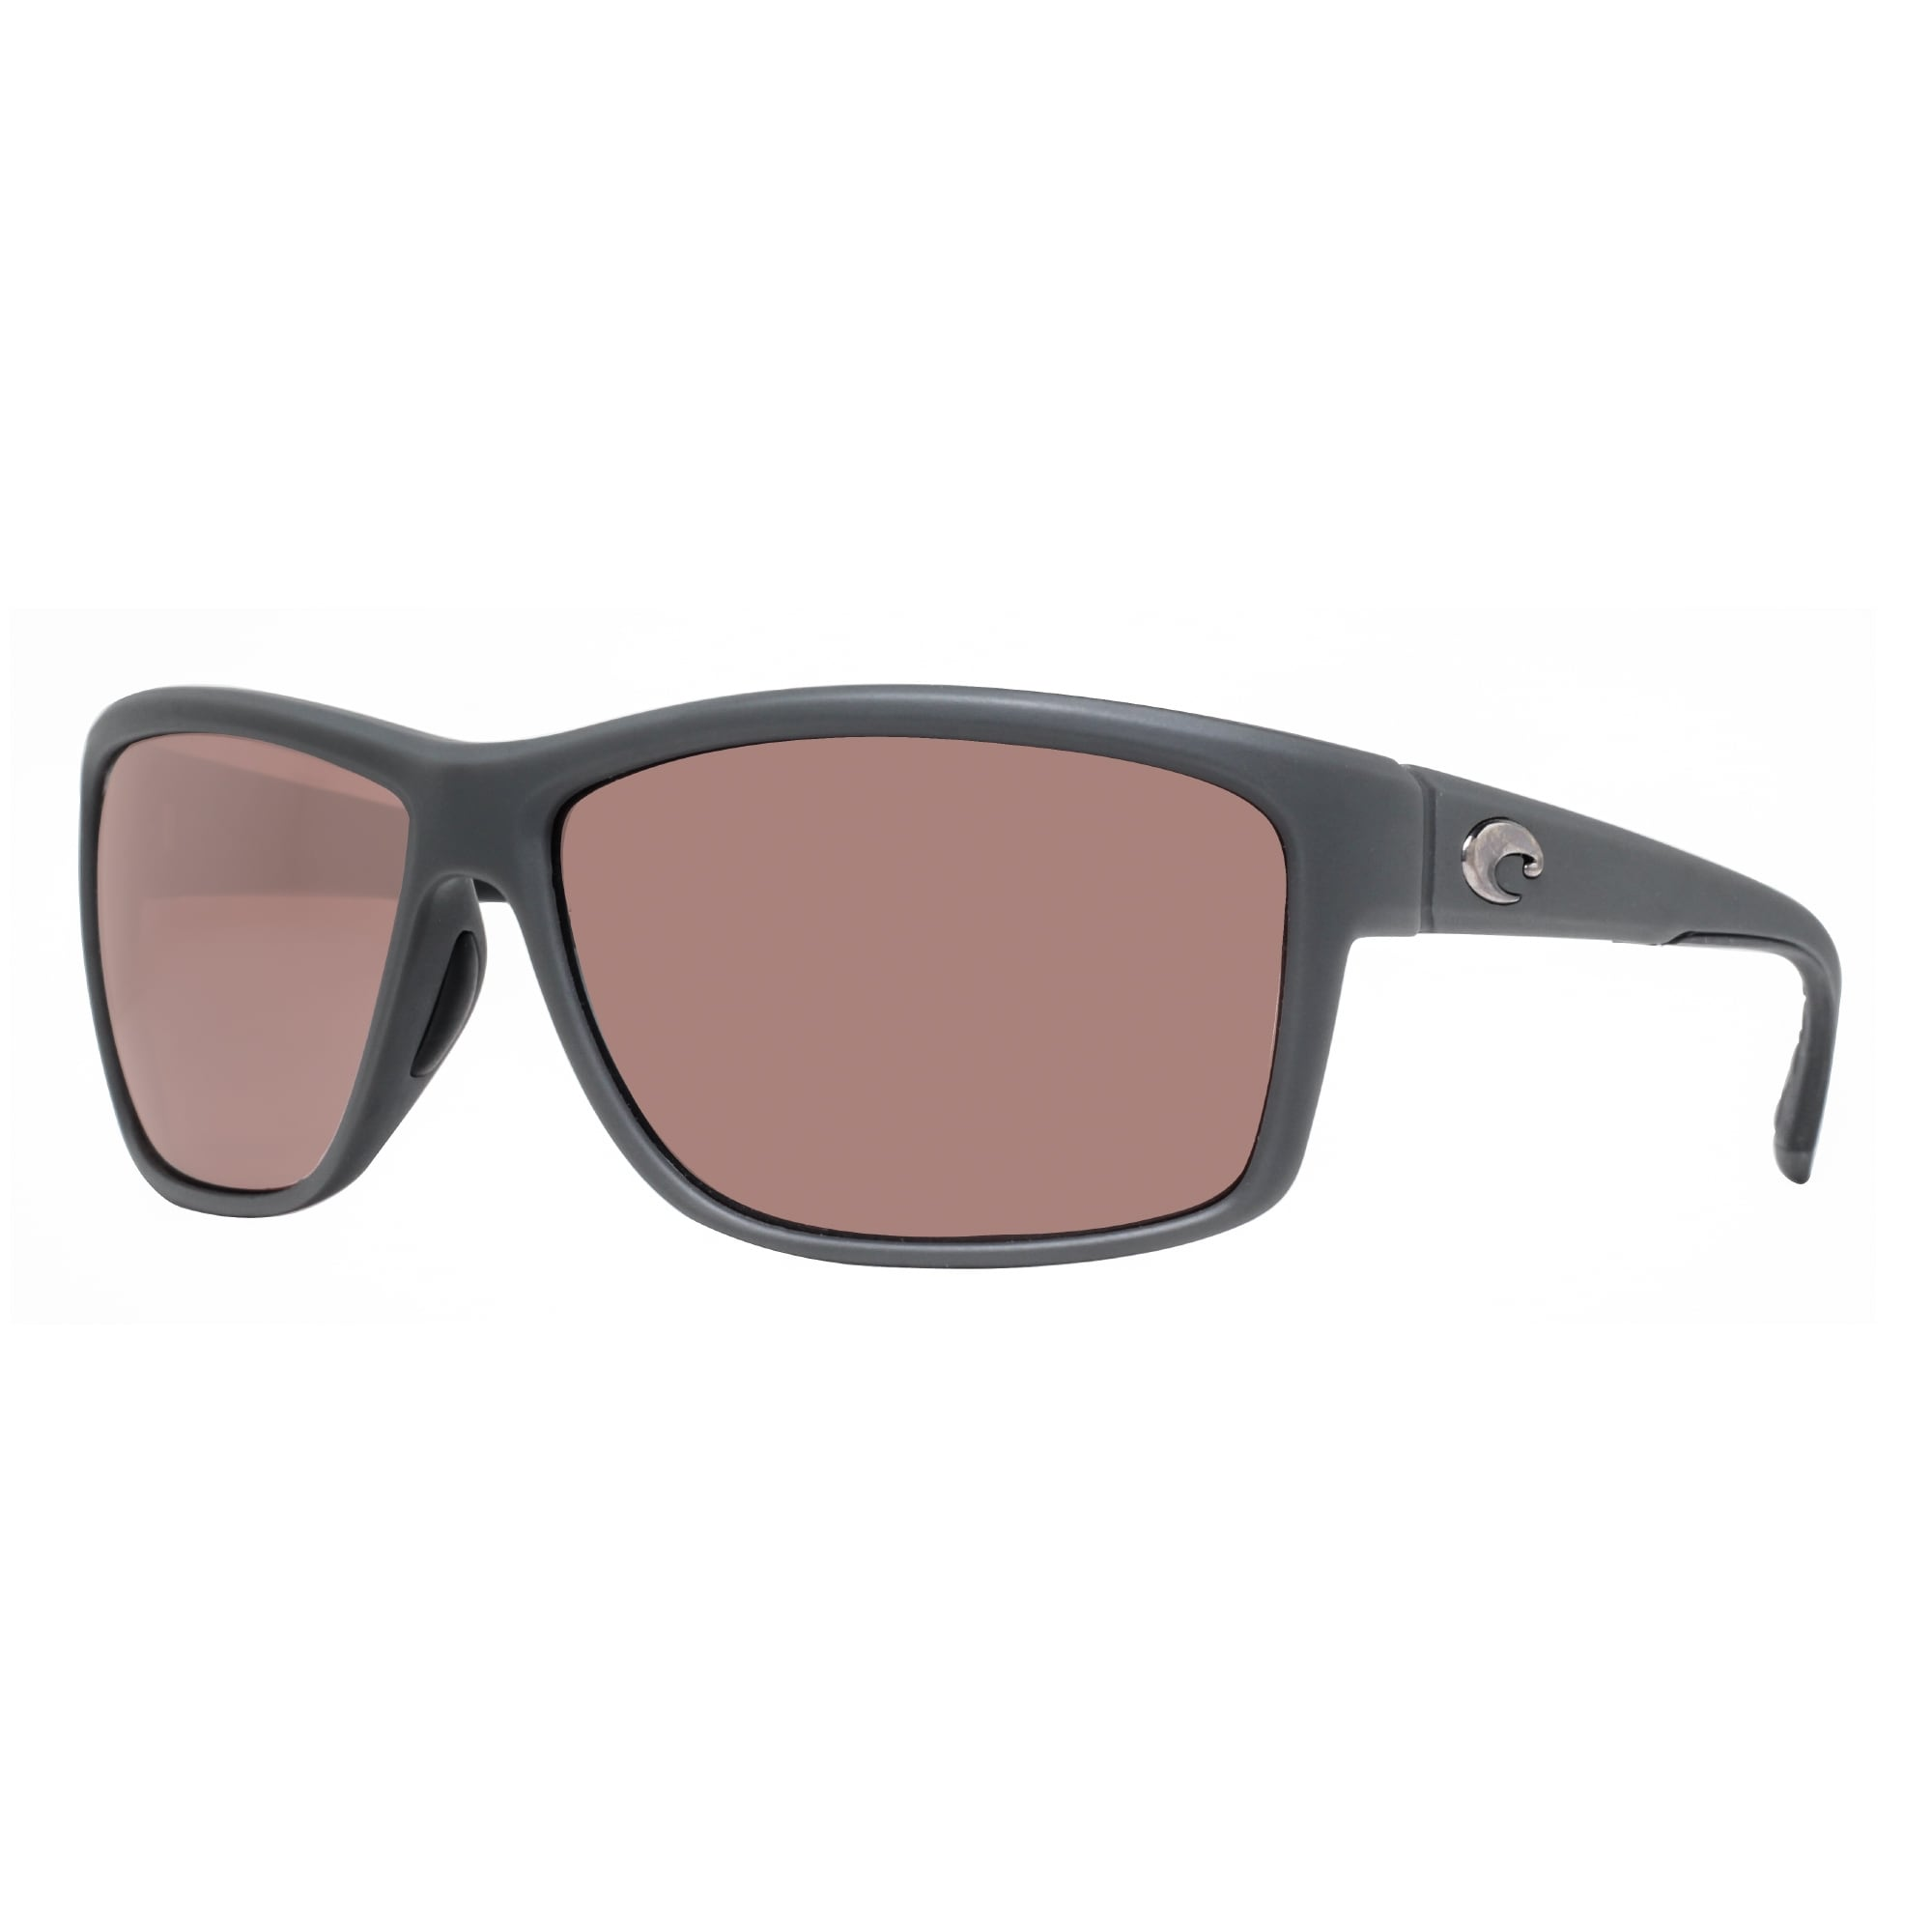 60bb55b45 Costa Del Mar Mag Bay AA98OSCP Matte Gray 580P Copper Silver Mirror  Sunglasses - matte grey - 63mm-14mm-132mm